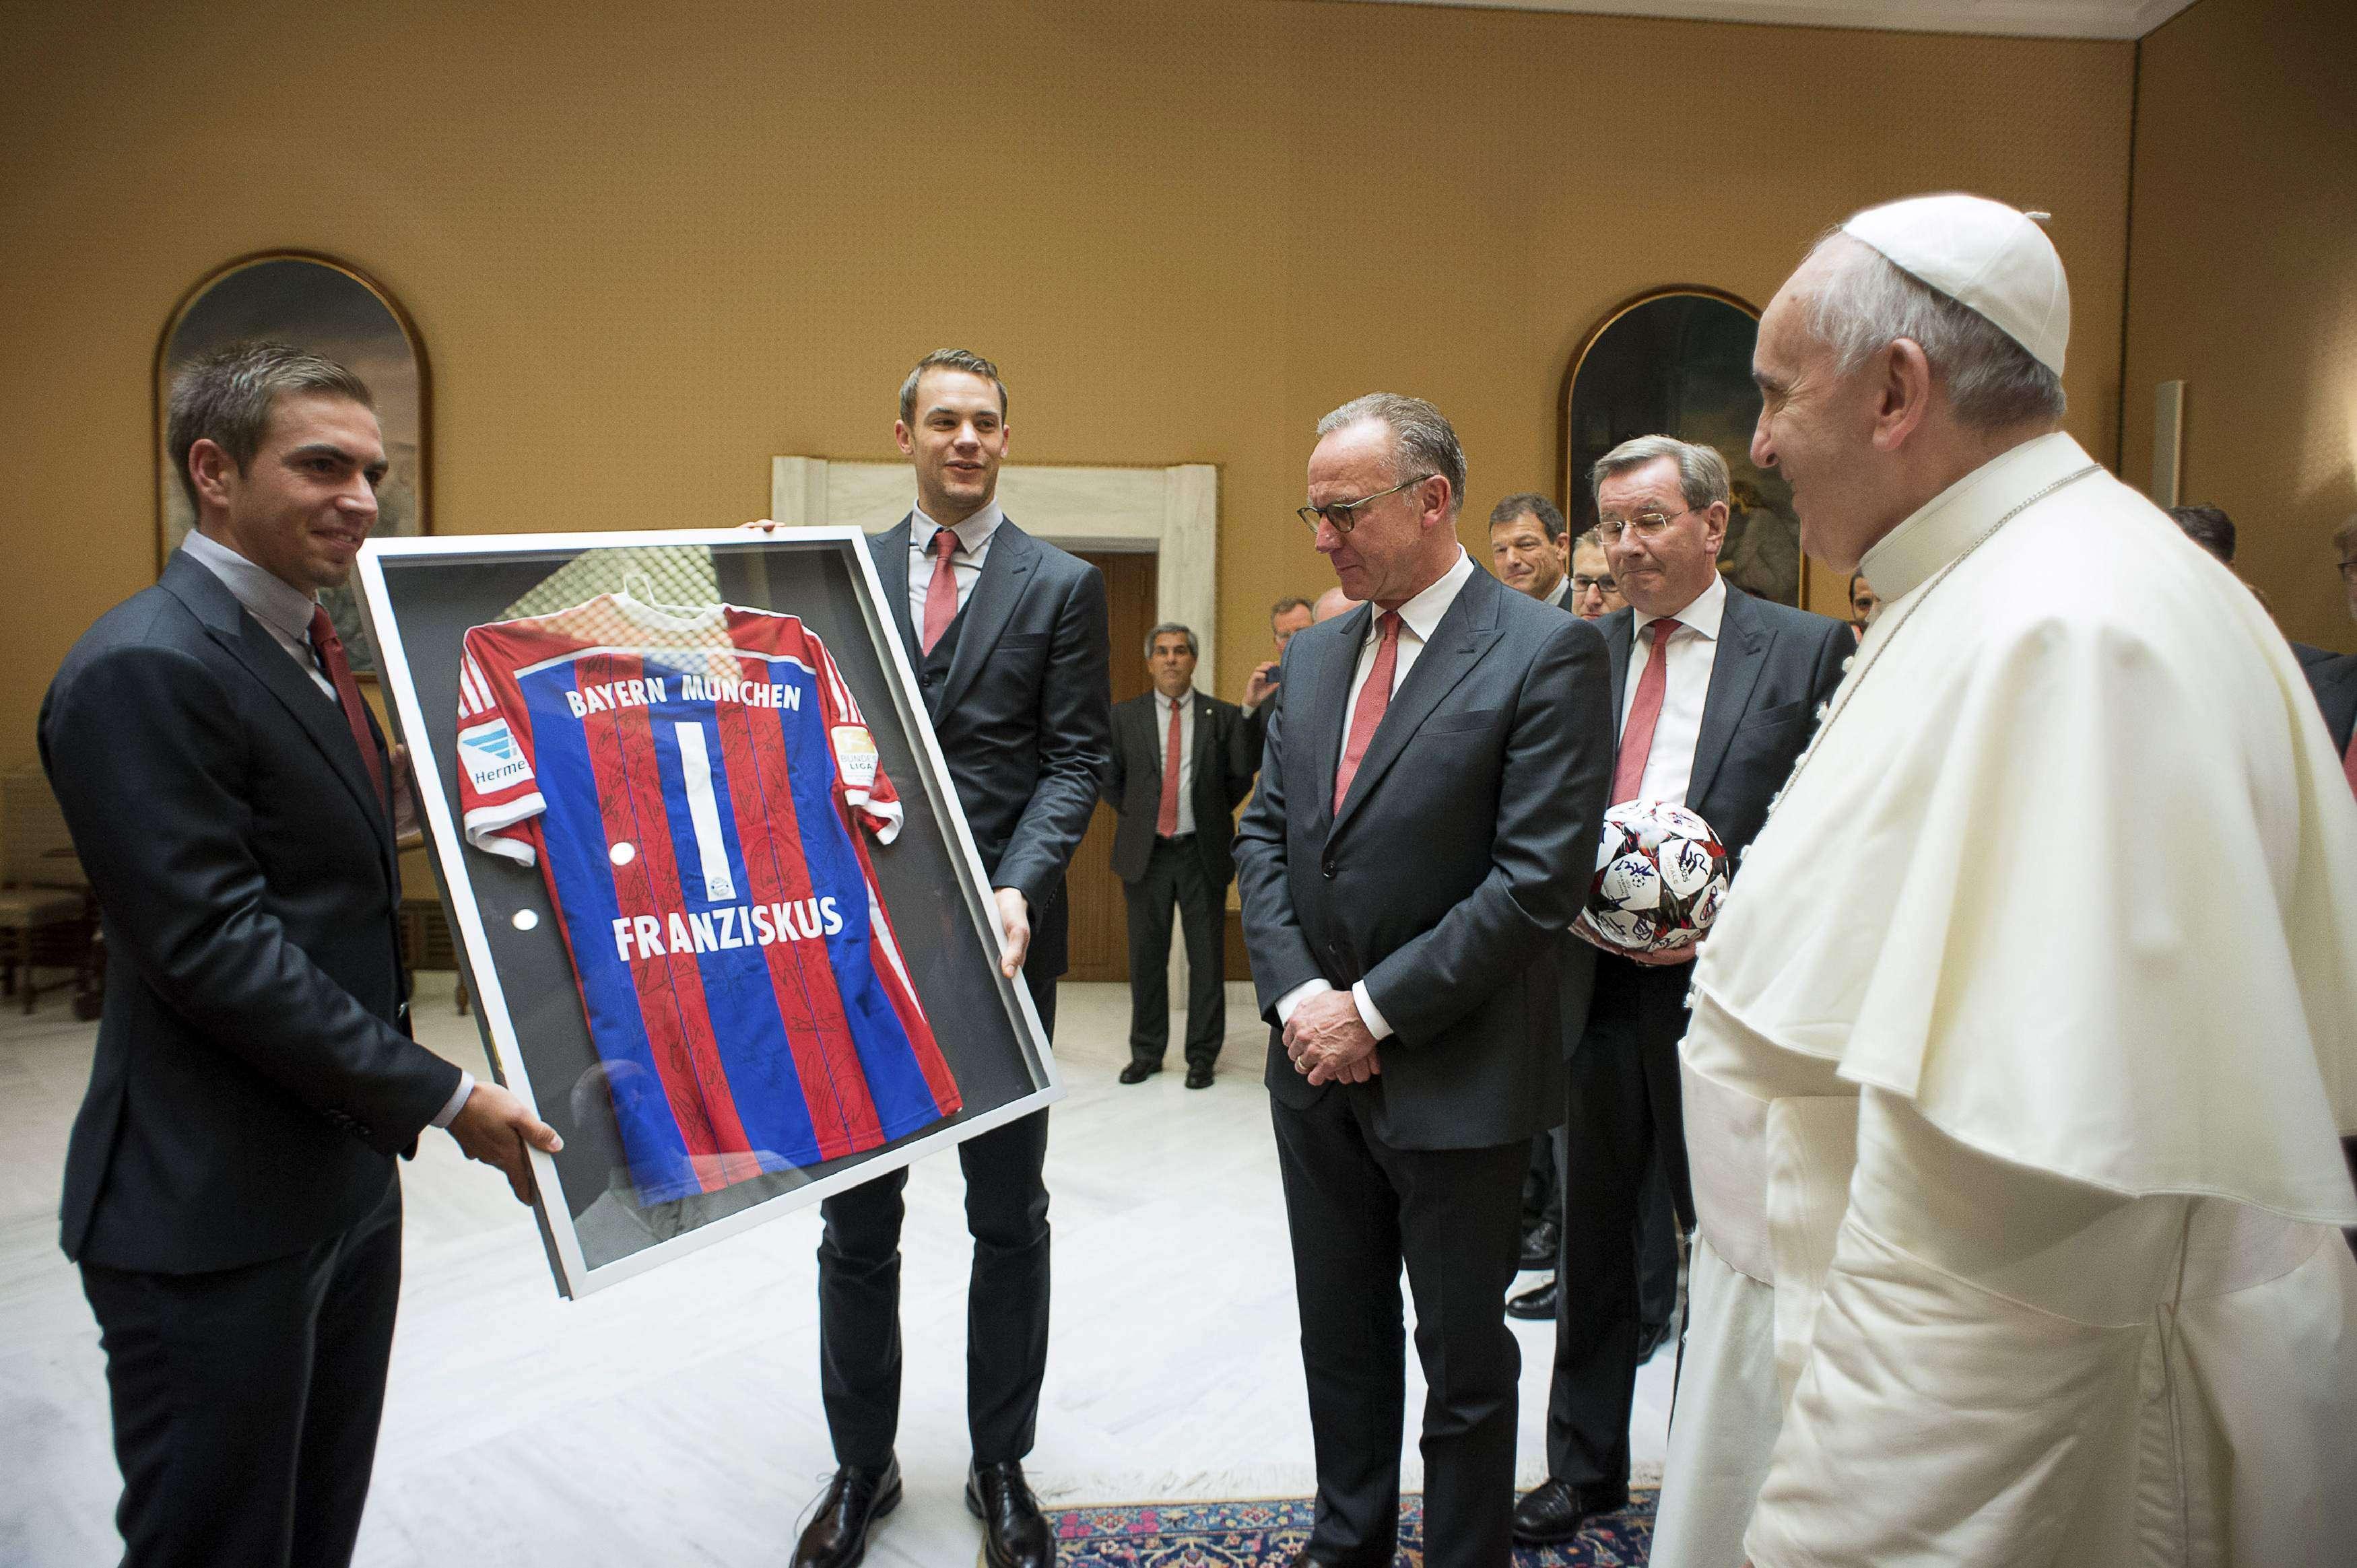 Foto: Osservatore Romano/Reuters